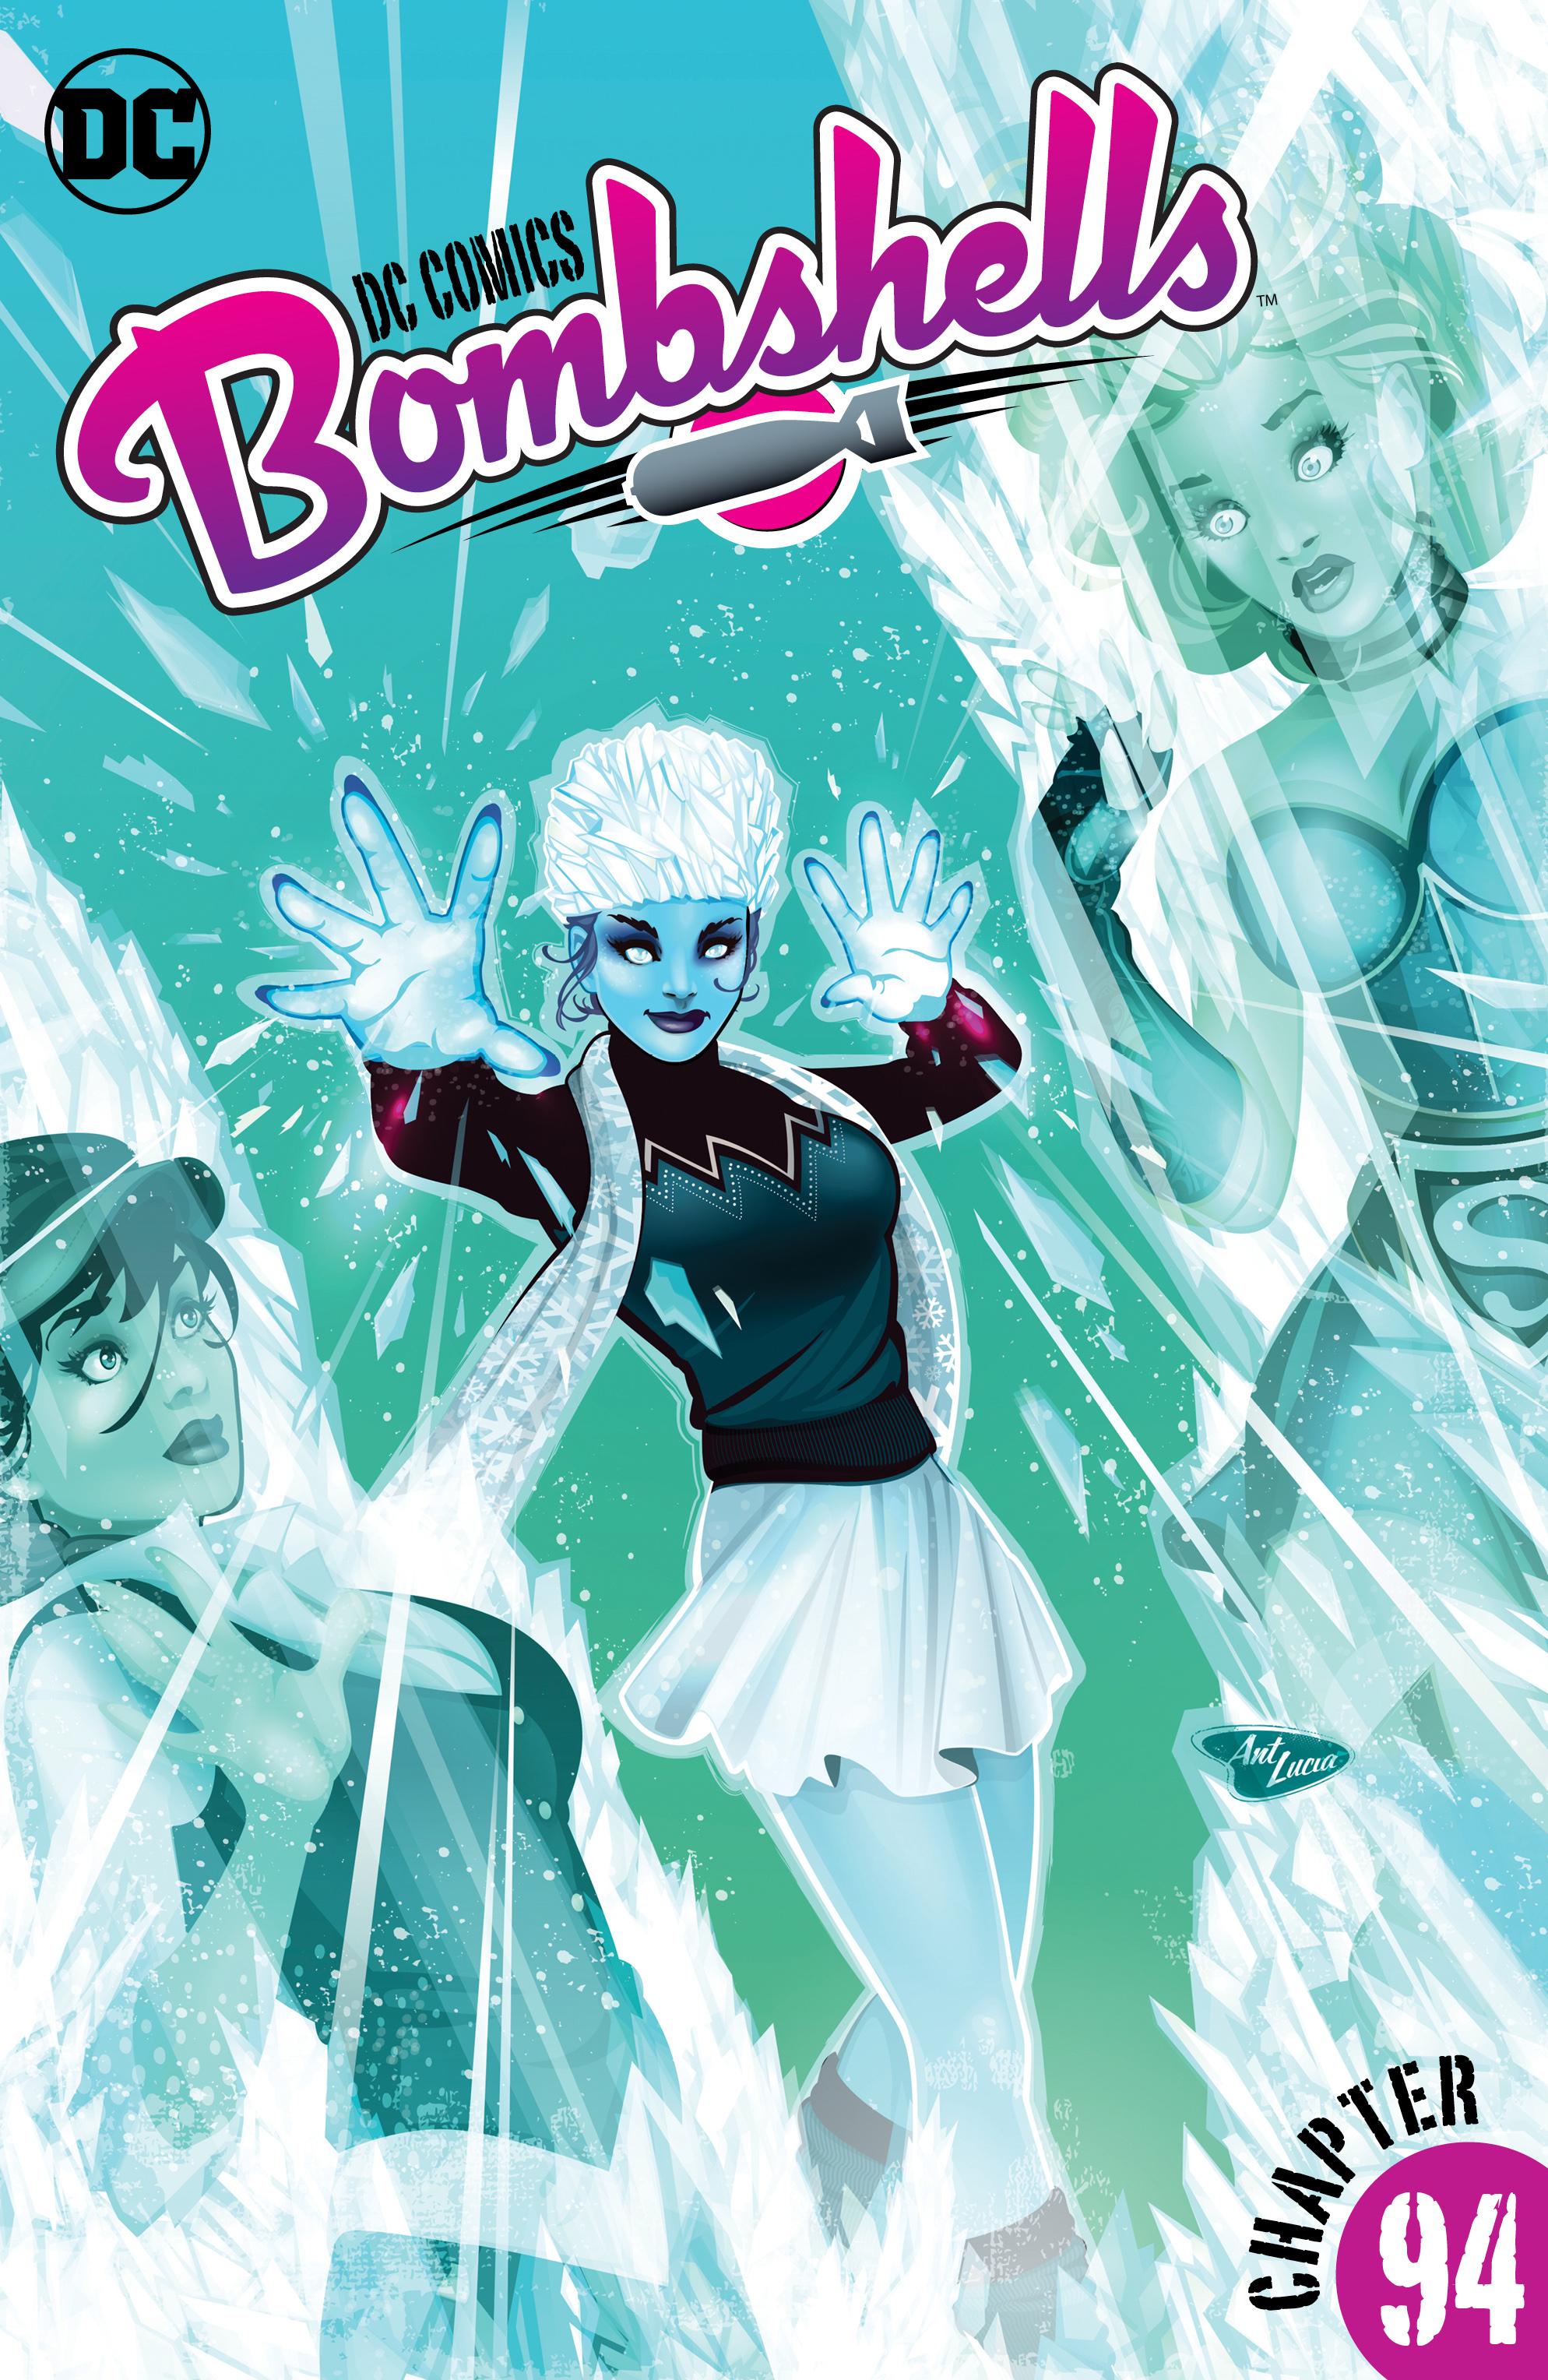 Read online DC Comics: Bombshells comic -  Issue #94 - 2